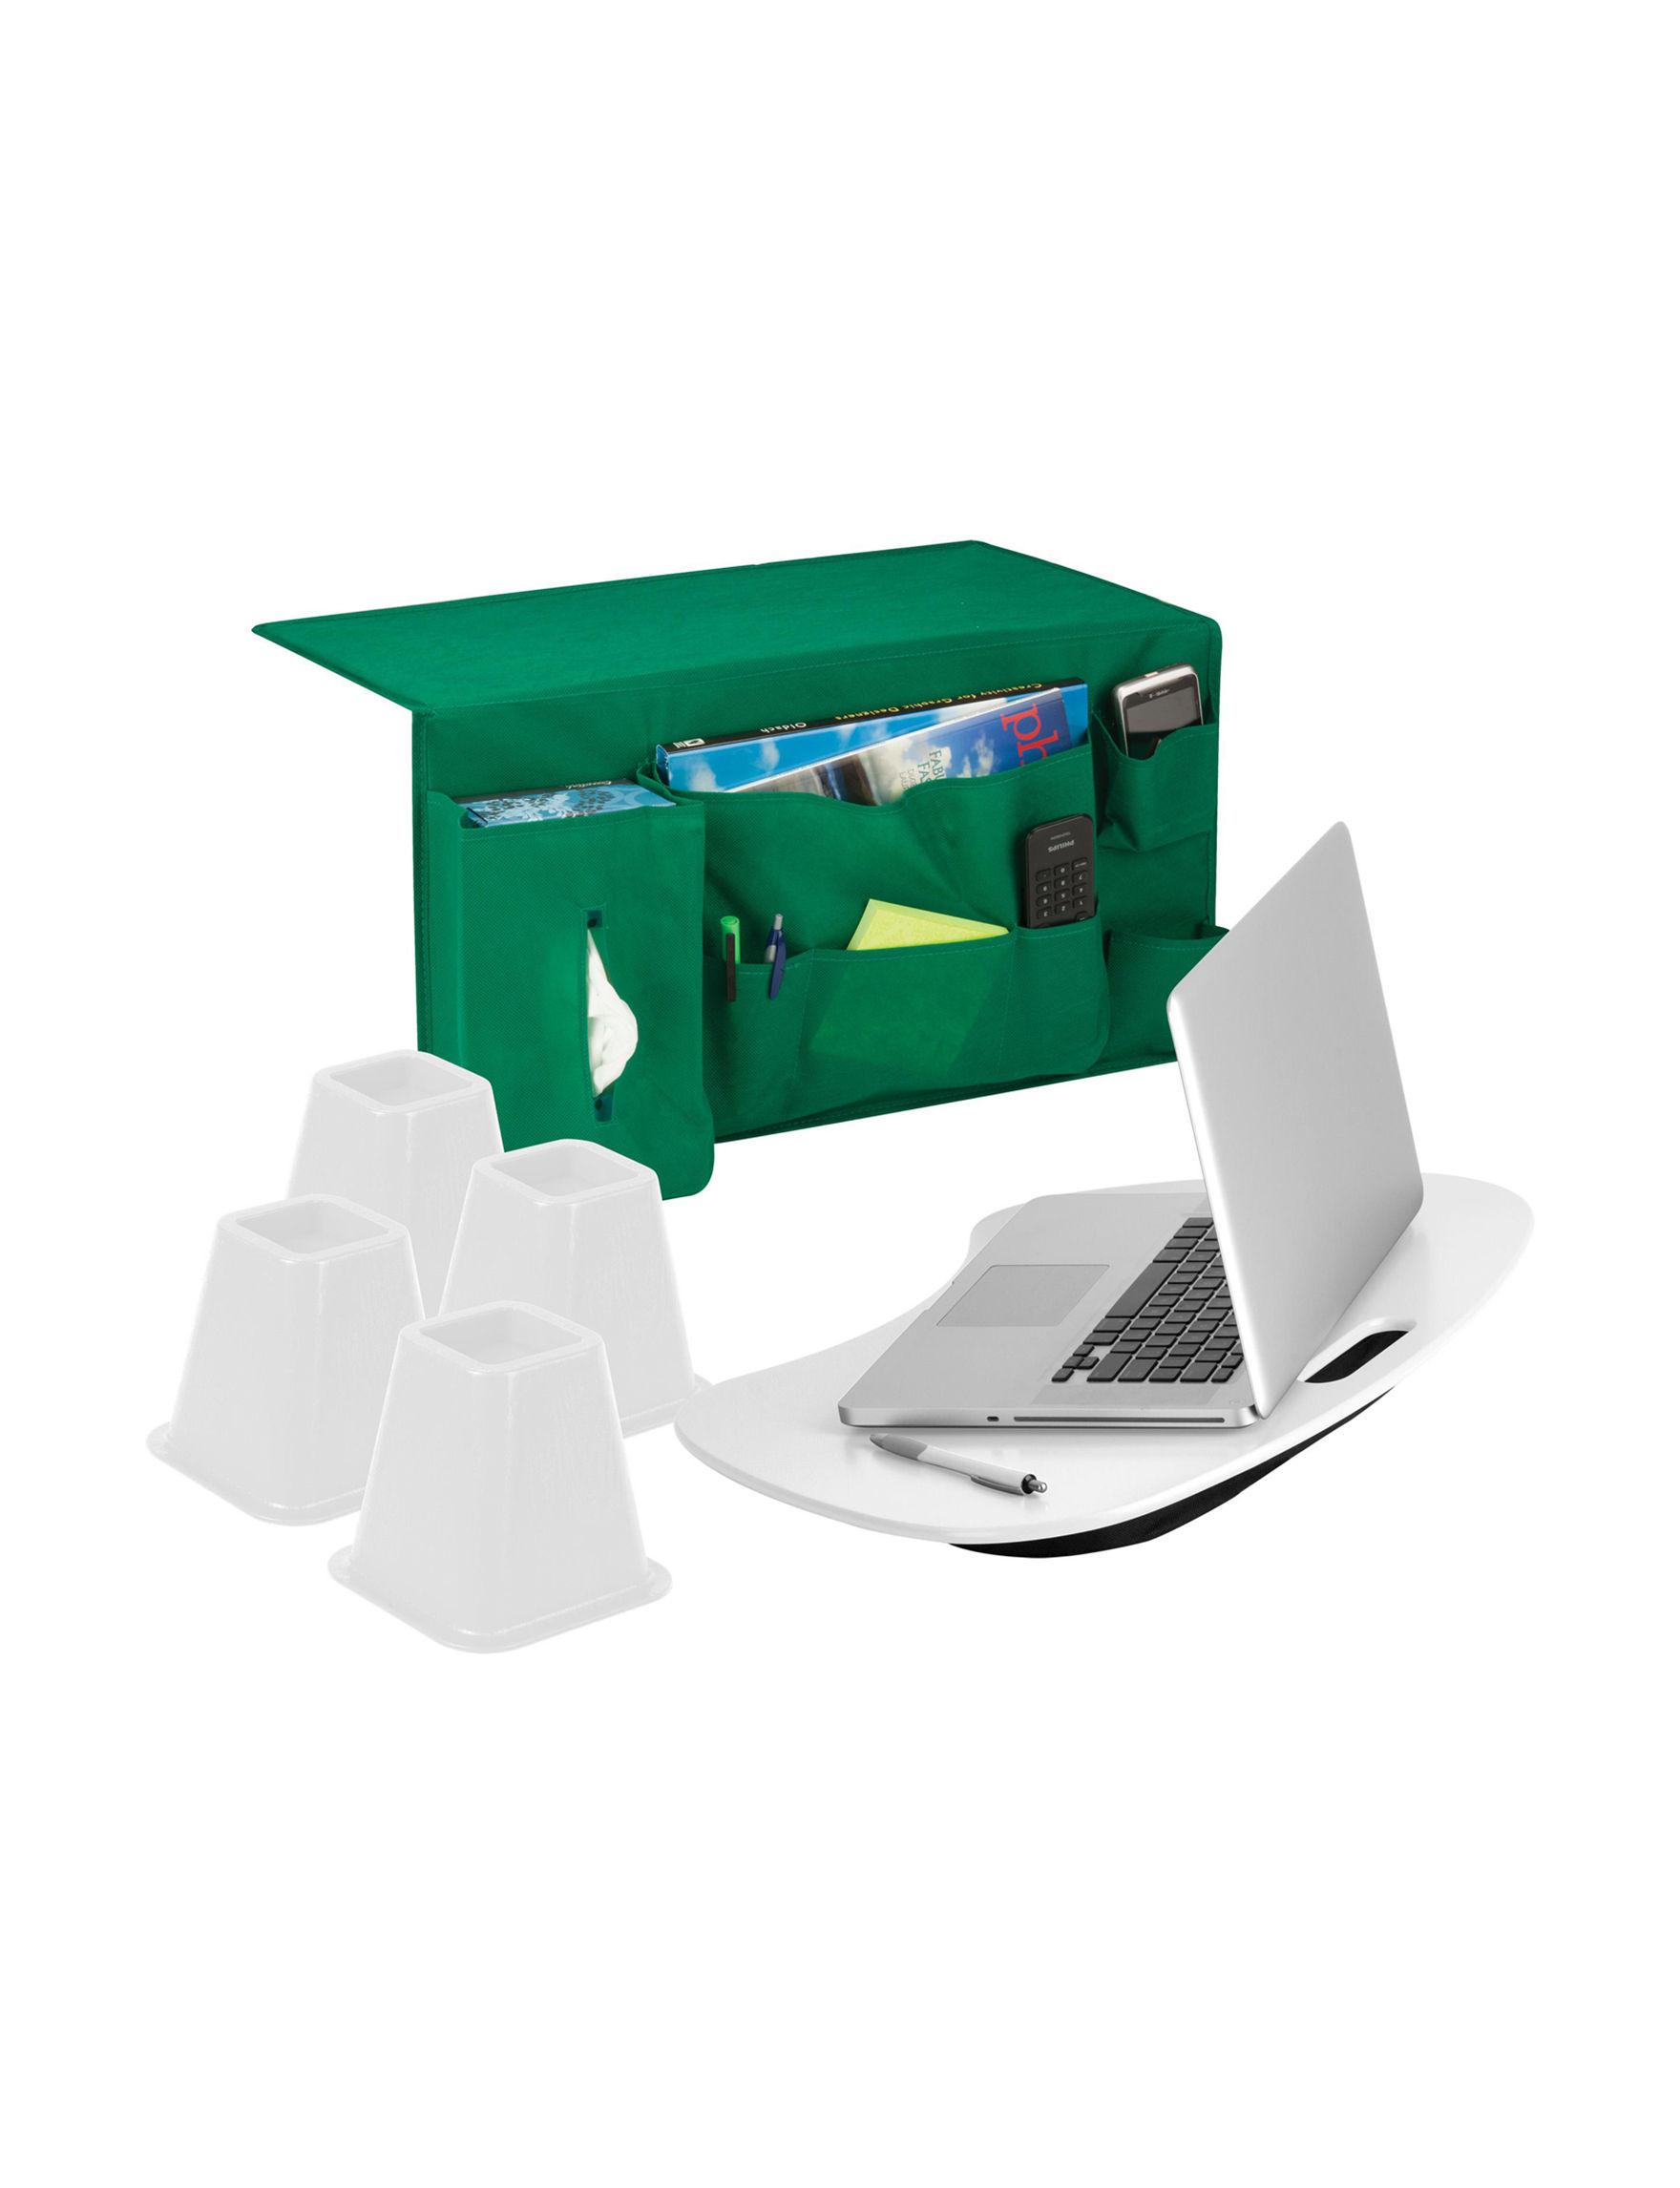 Honey-Can-Do International White / Green Storage & Organization